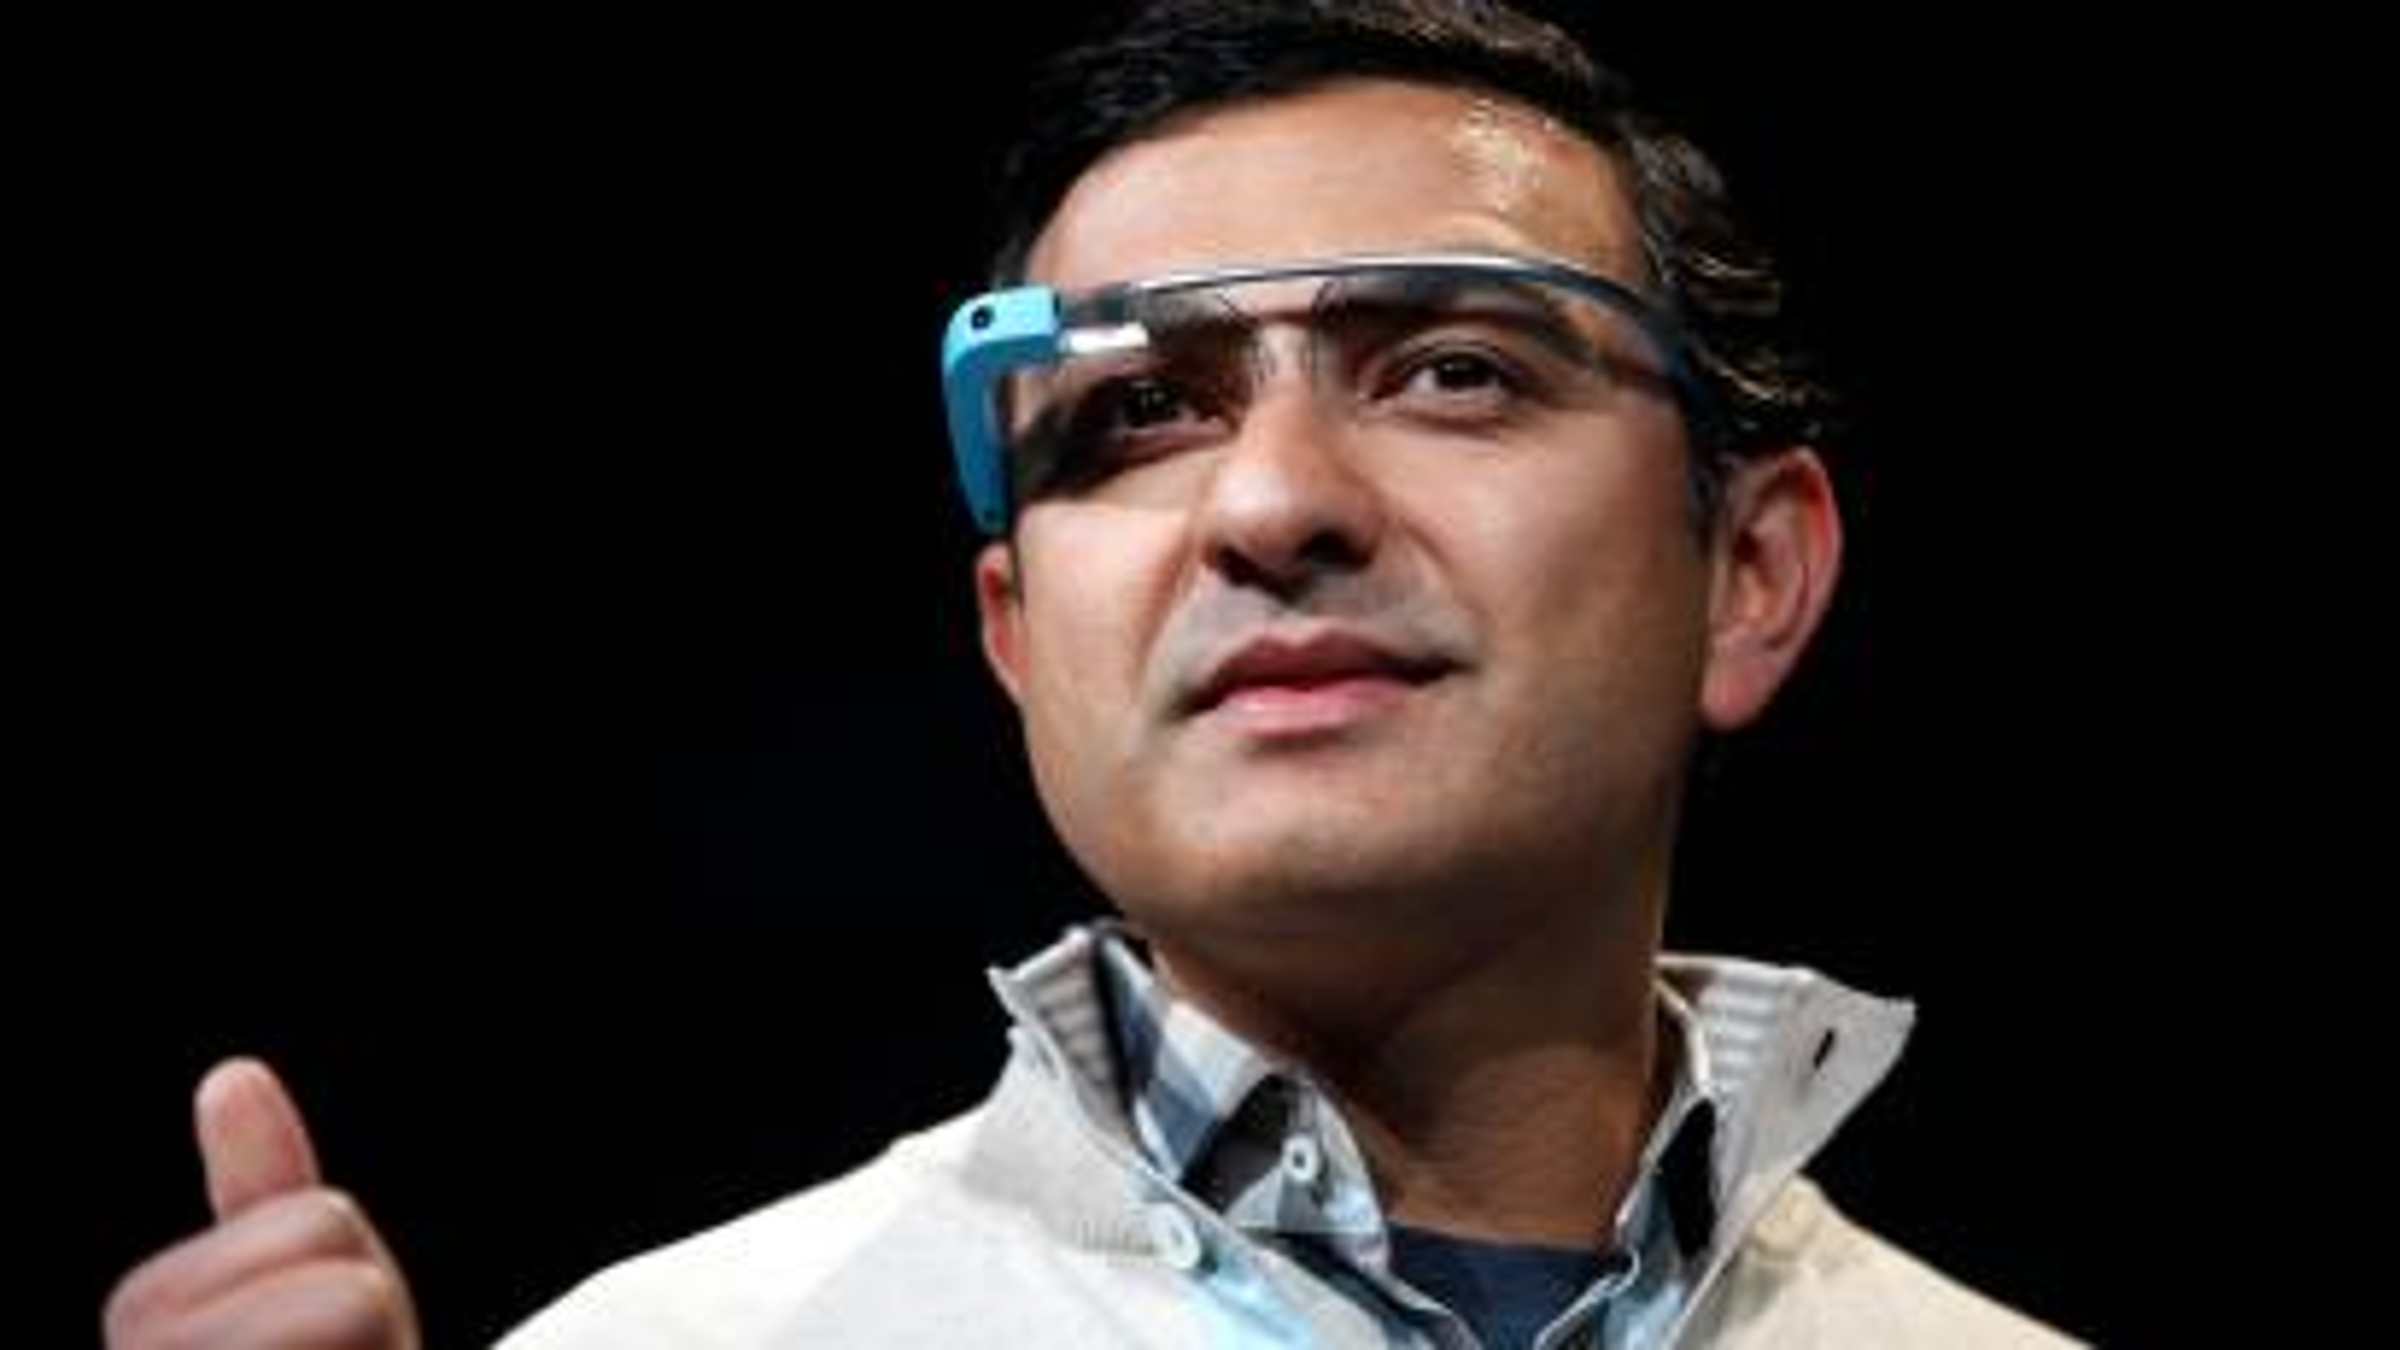 Vic Gundotra, Senior Vice President of Google, wears a Google Glass during a keynote at Google I/O Conference at Moscone Center in San Francisco, California June 28, 2012.